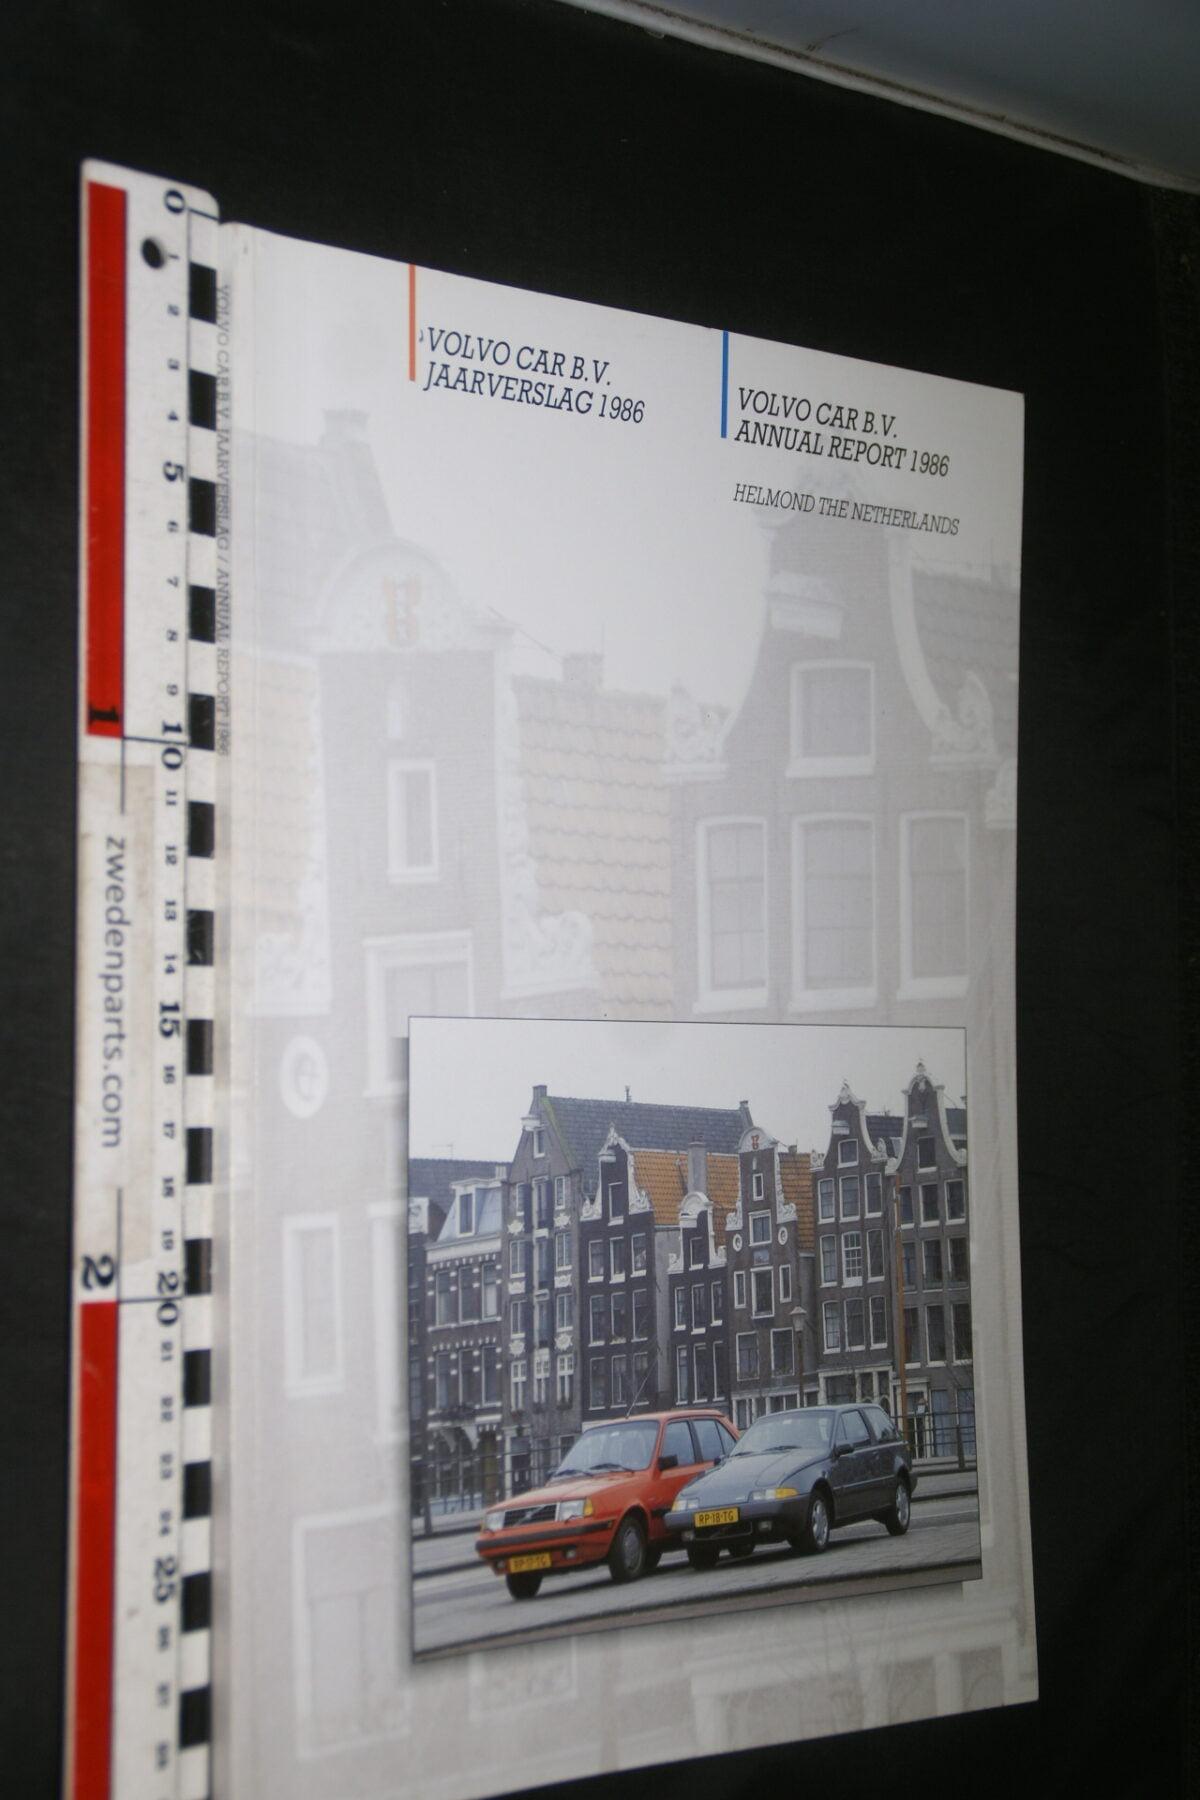 DSC03326 1987 origineel boek jaarverslag Volvo nr. VCBV-CPR 6500, Nederlands en English-f37c0d1b